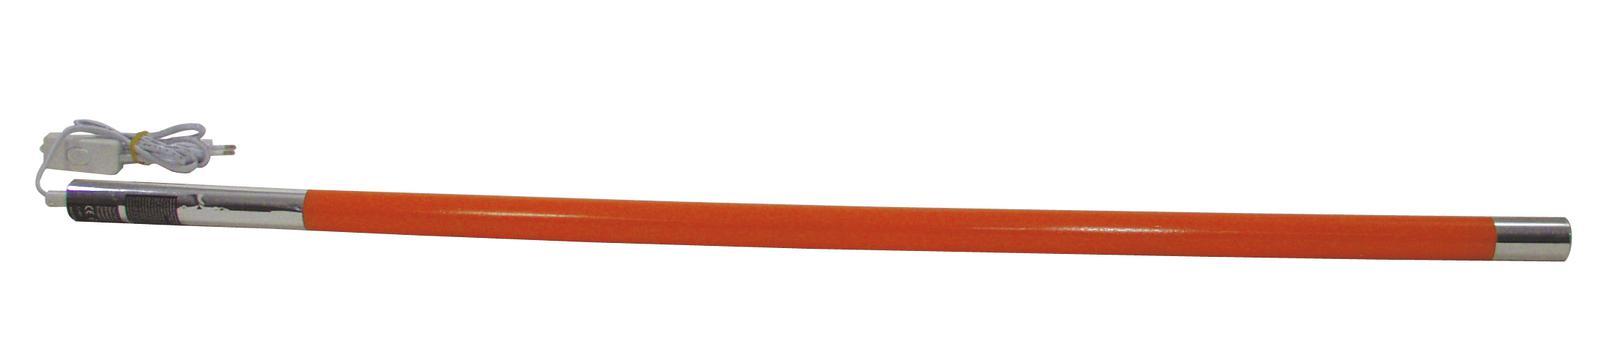 EUROLITE Leuchtstab T5 20W 105cm orange